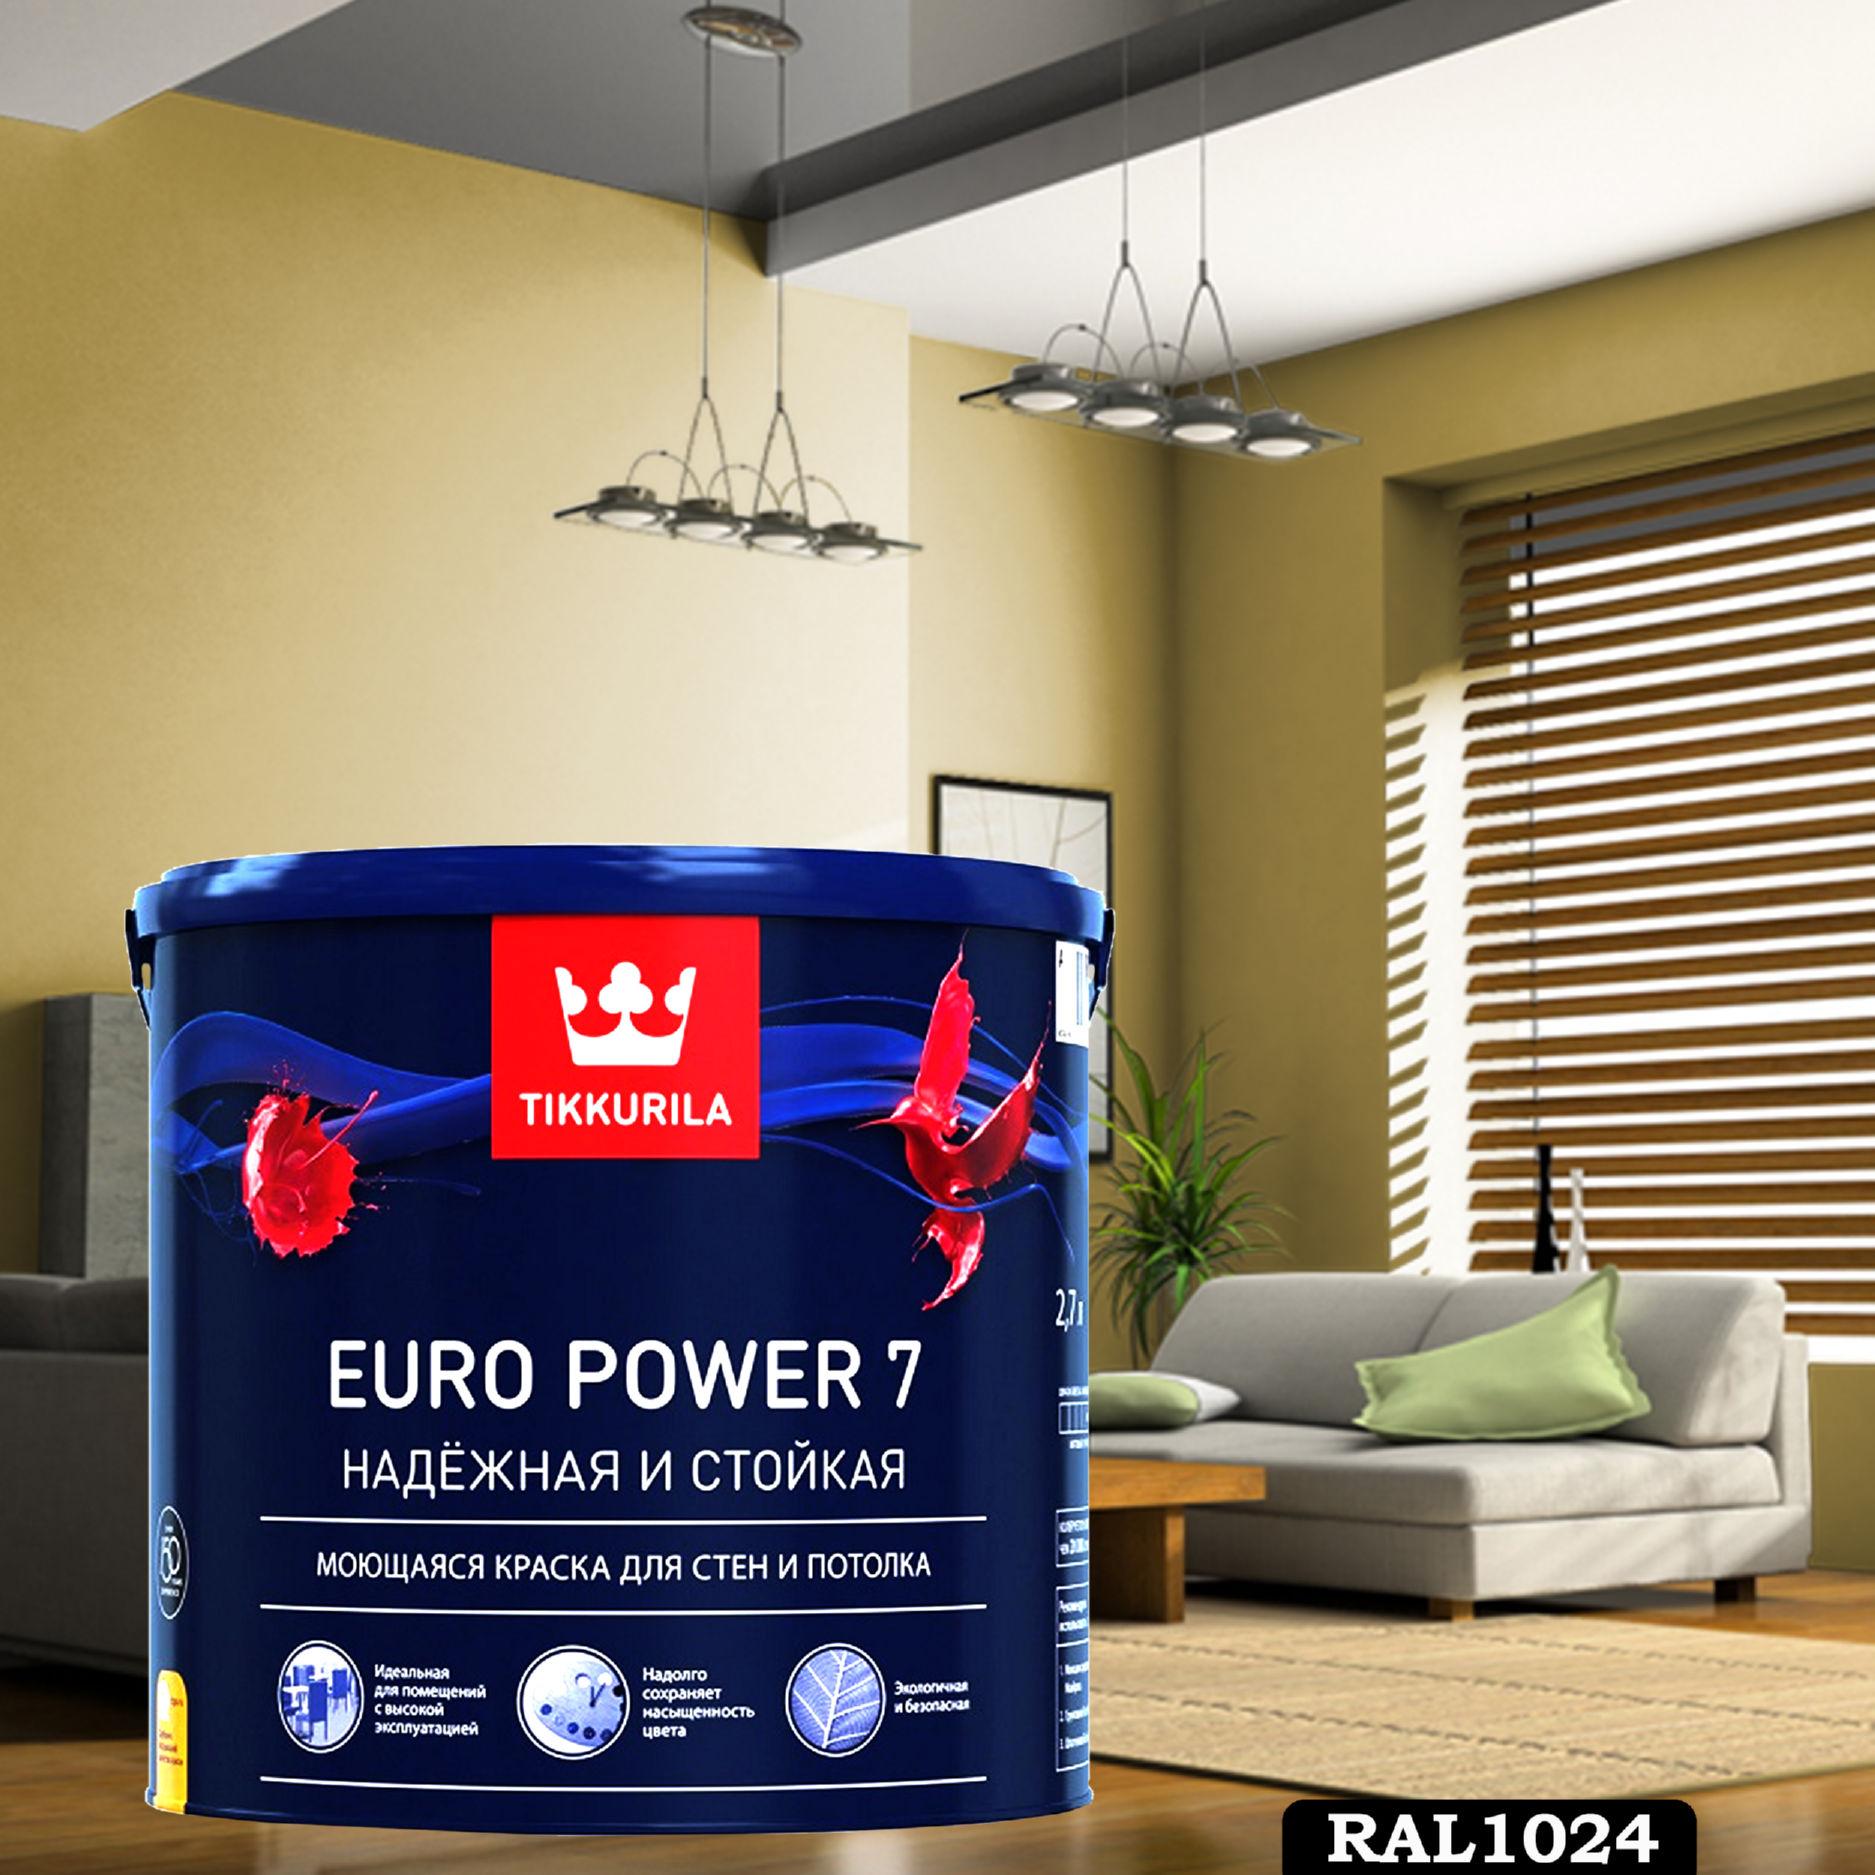 Фото 21 - Краска TIKKURILA Euro Power 7,  RAL 1024 Жёлтая-охра, латексная моющаяся матовая интерьерная, 9 л.